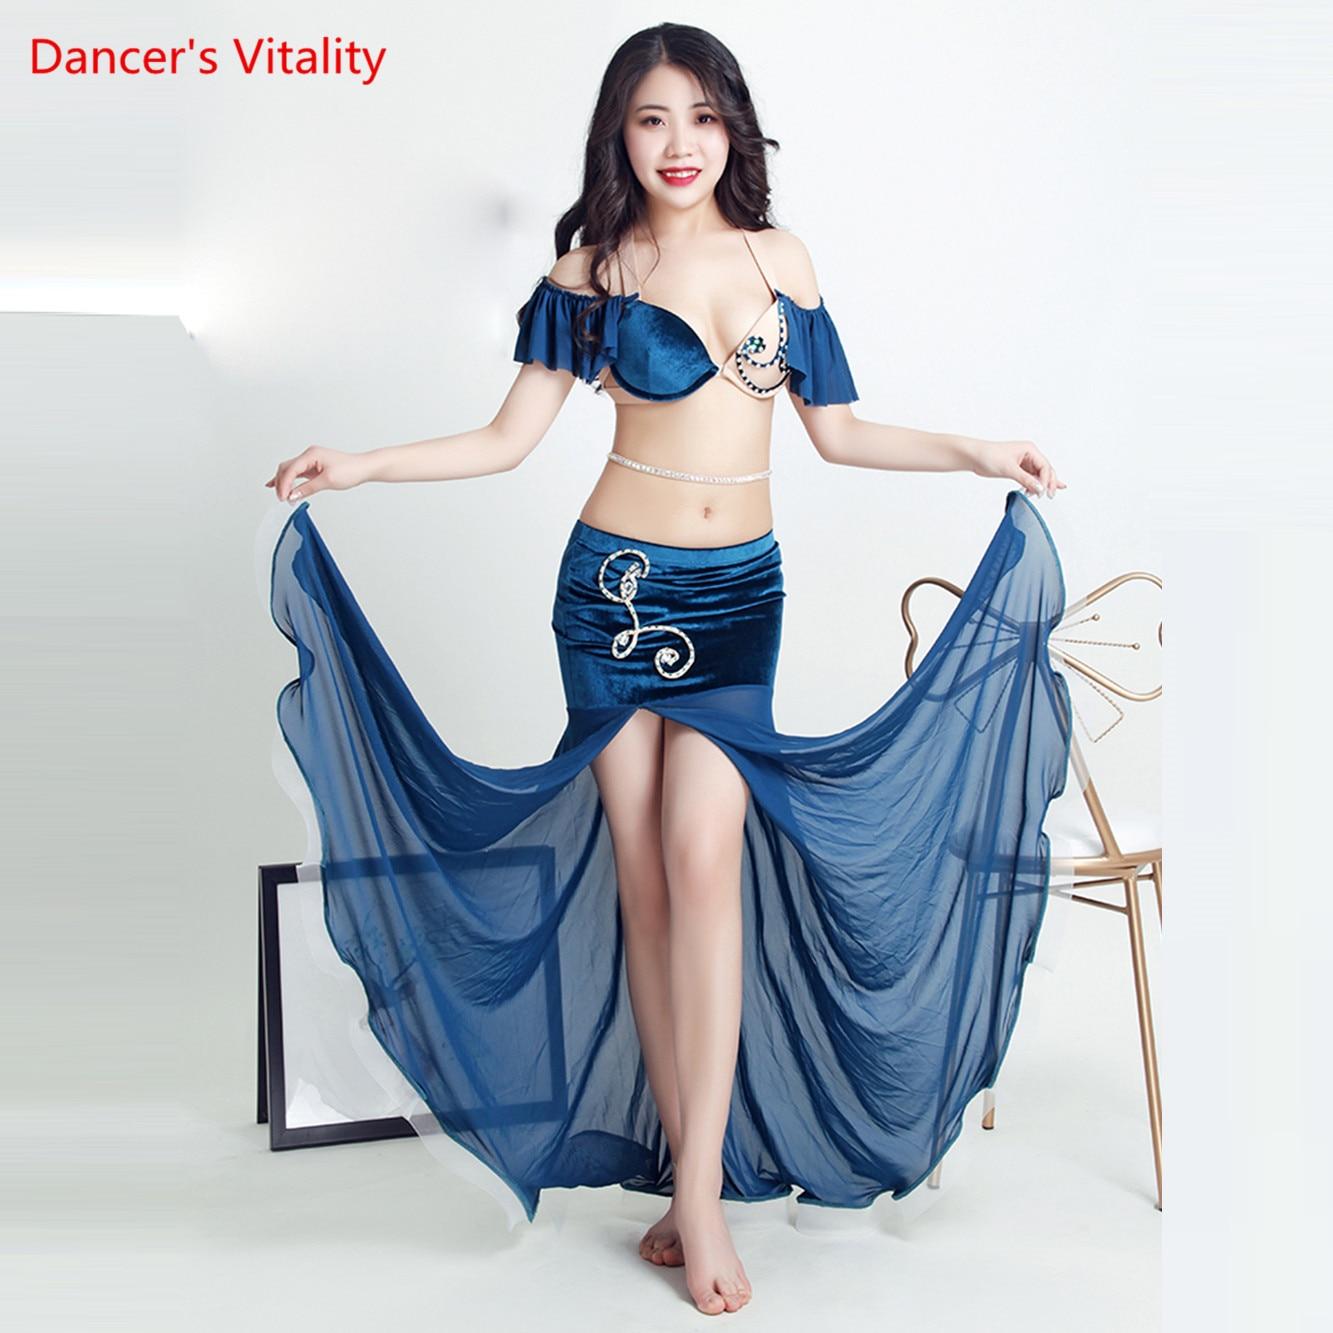 New Belly Bance Costume Suit Beginner Oriental Dance Dance Performance Clothing Sexy Bra+Split Long Skirt